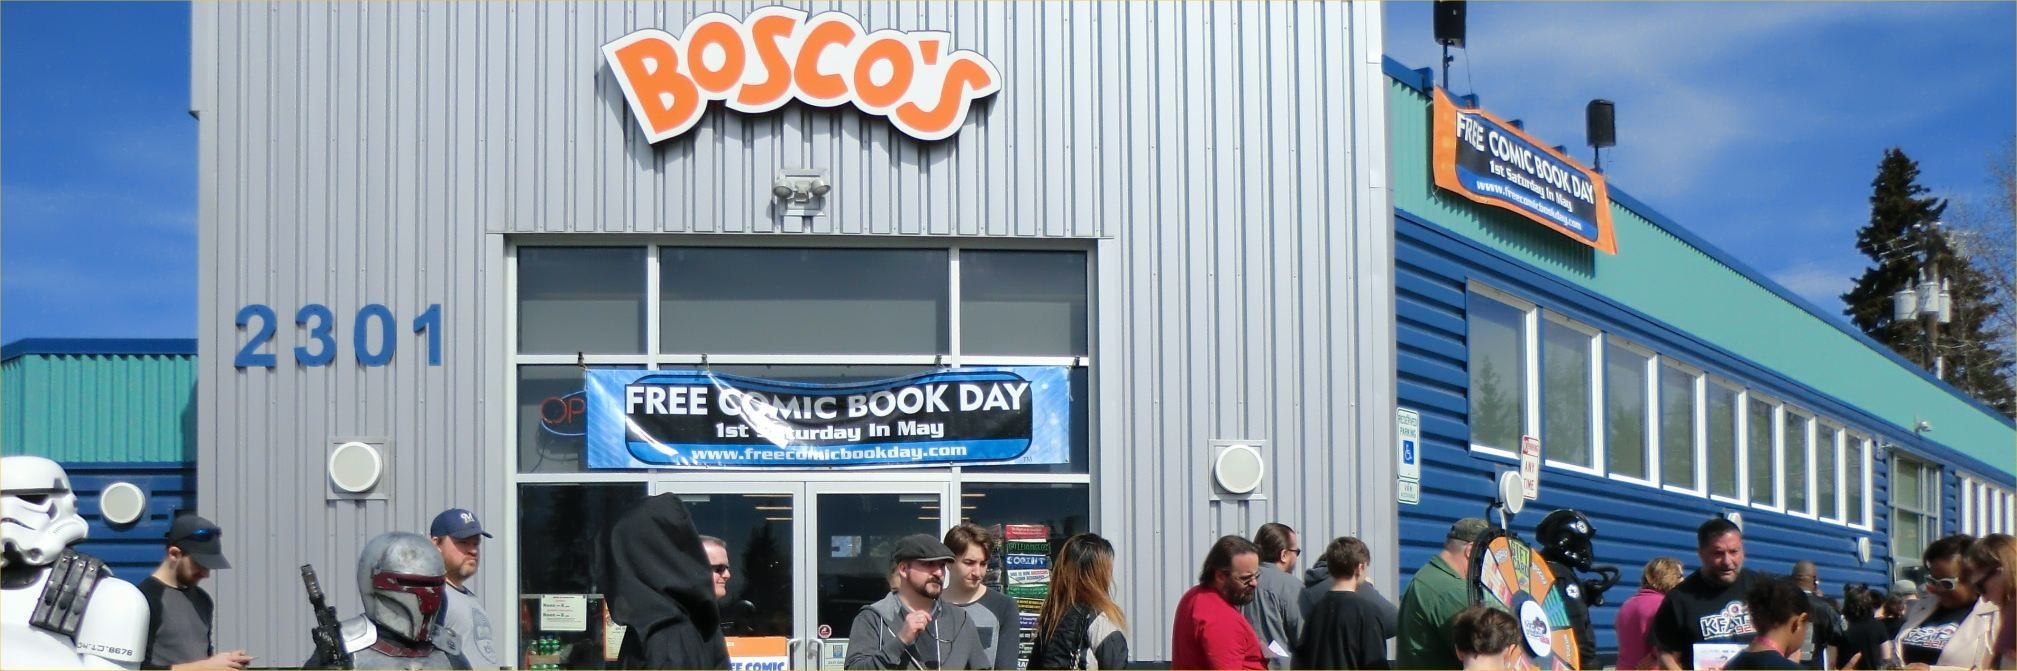 Bosco's to BOSCO'S, a kaleidoscope of pop culture